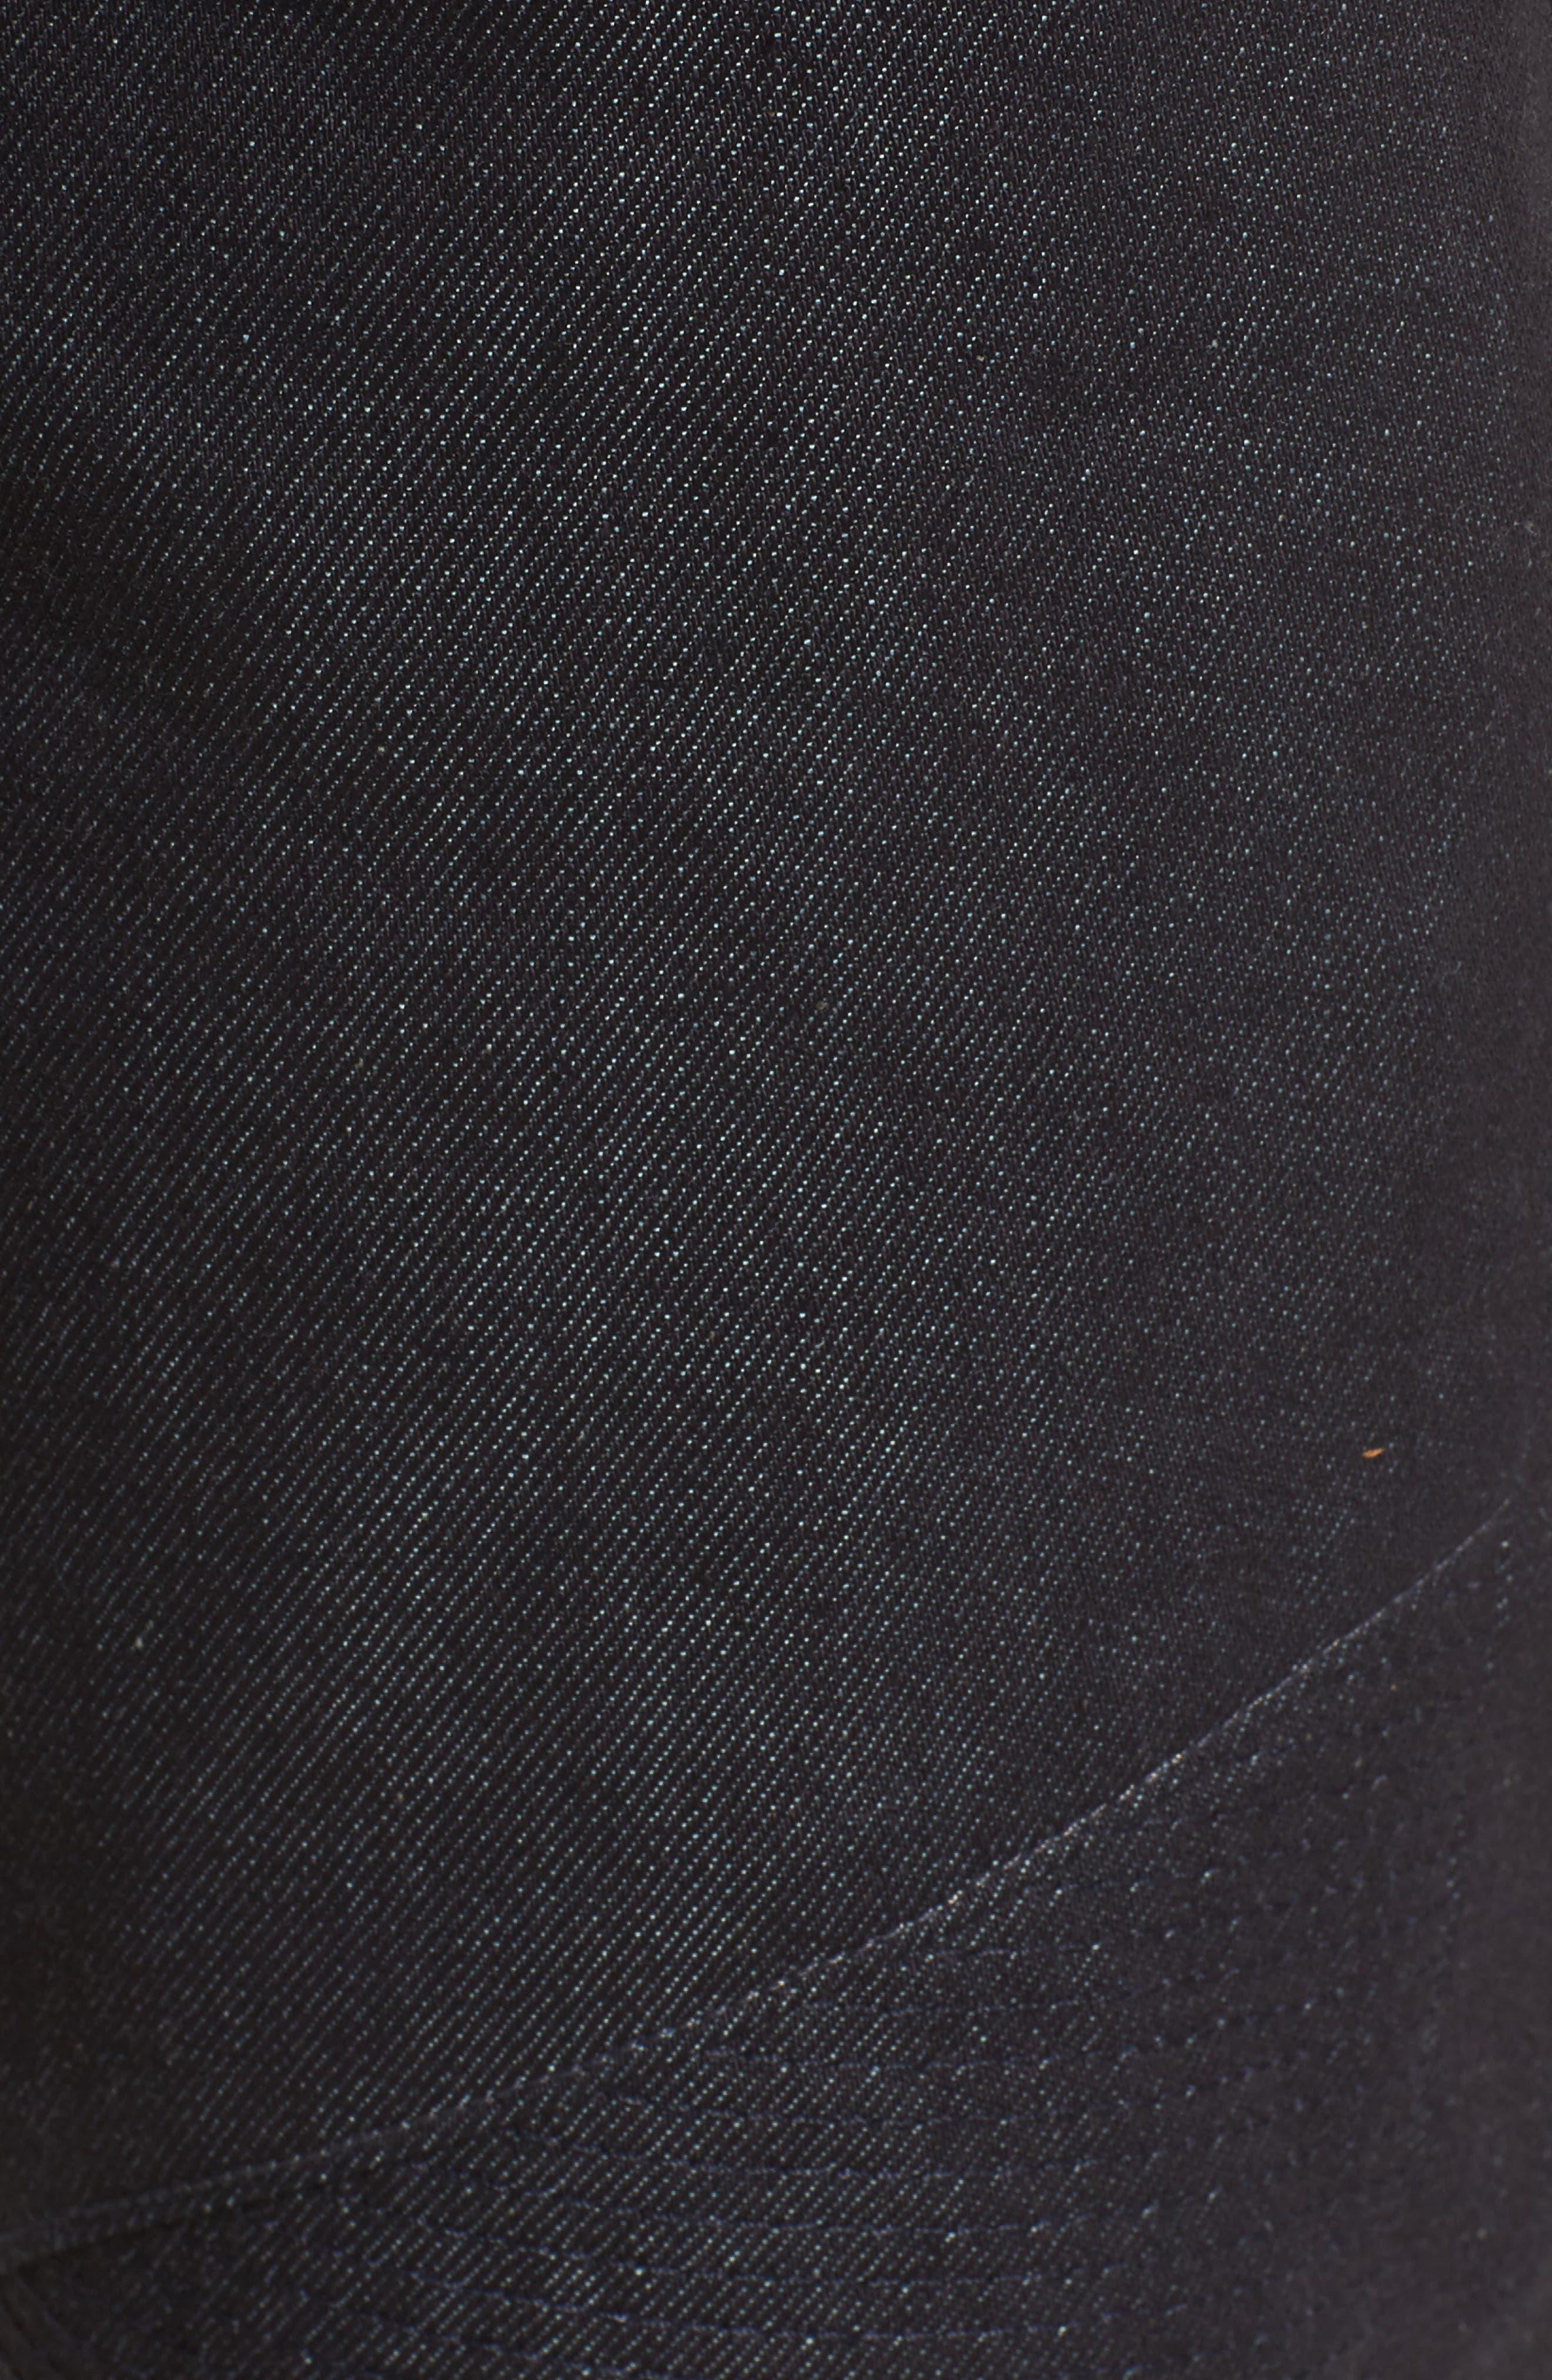 Blinder Biker Skinny Fit Jeans,                             Alternate thumbnail 5, color,                             Raw